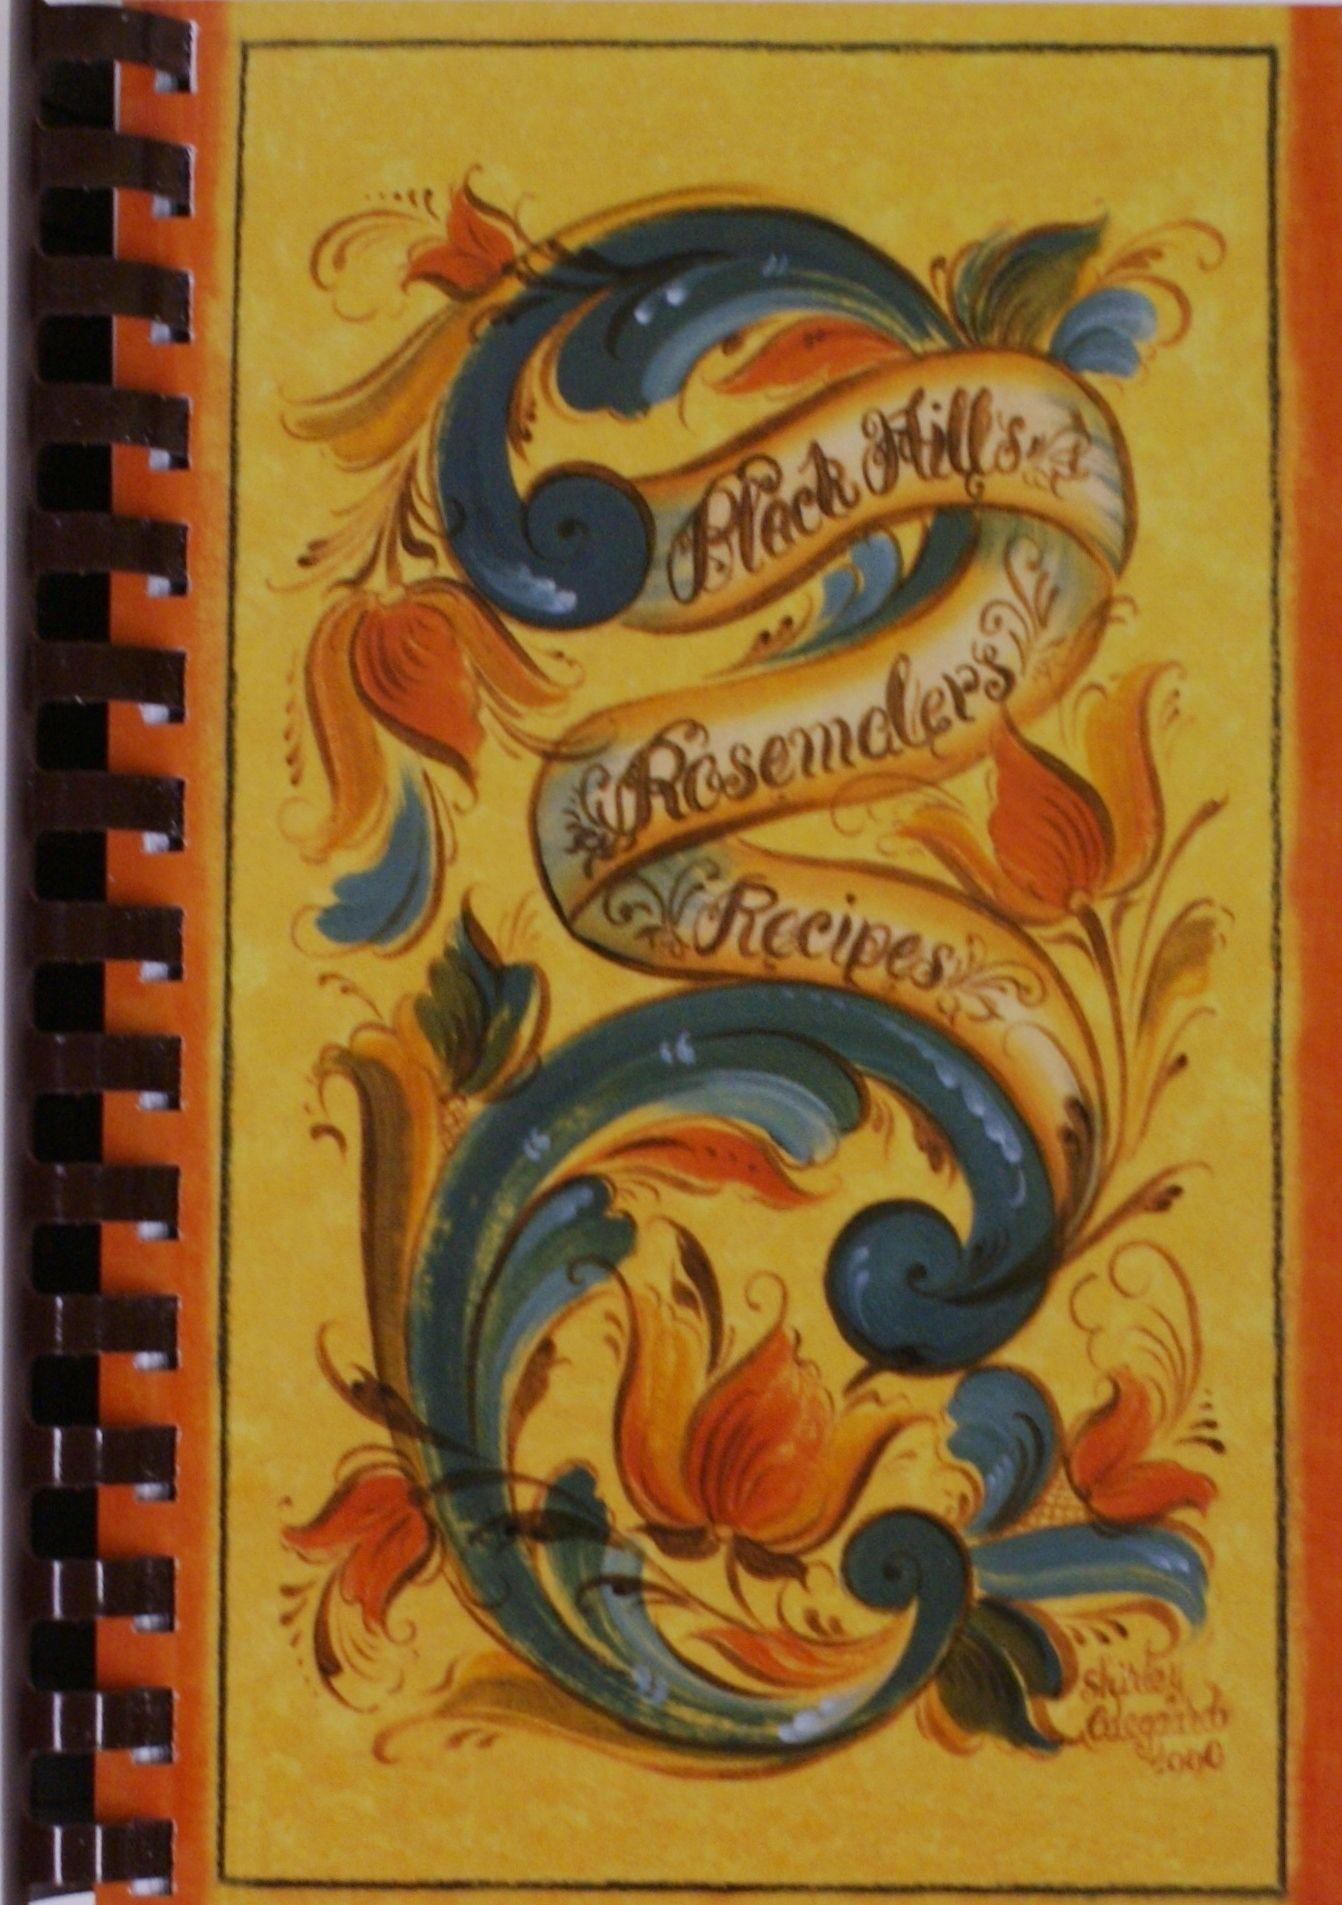 Black hills rosemalers recipes scandinavian folk art